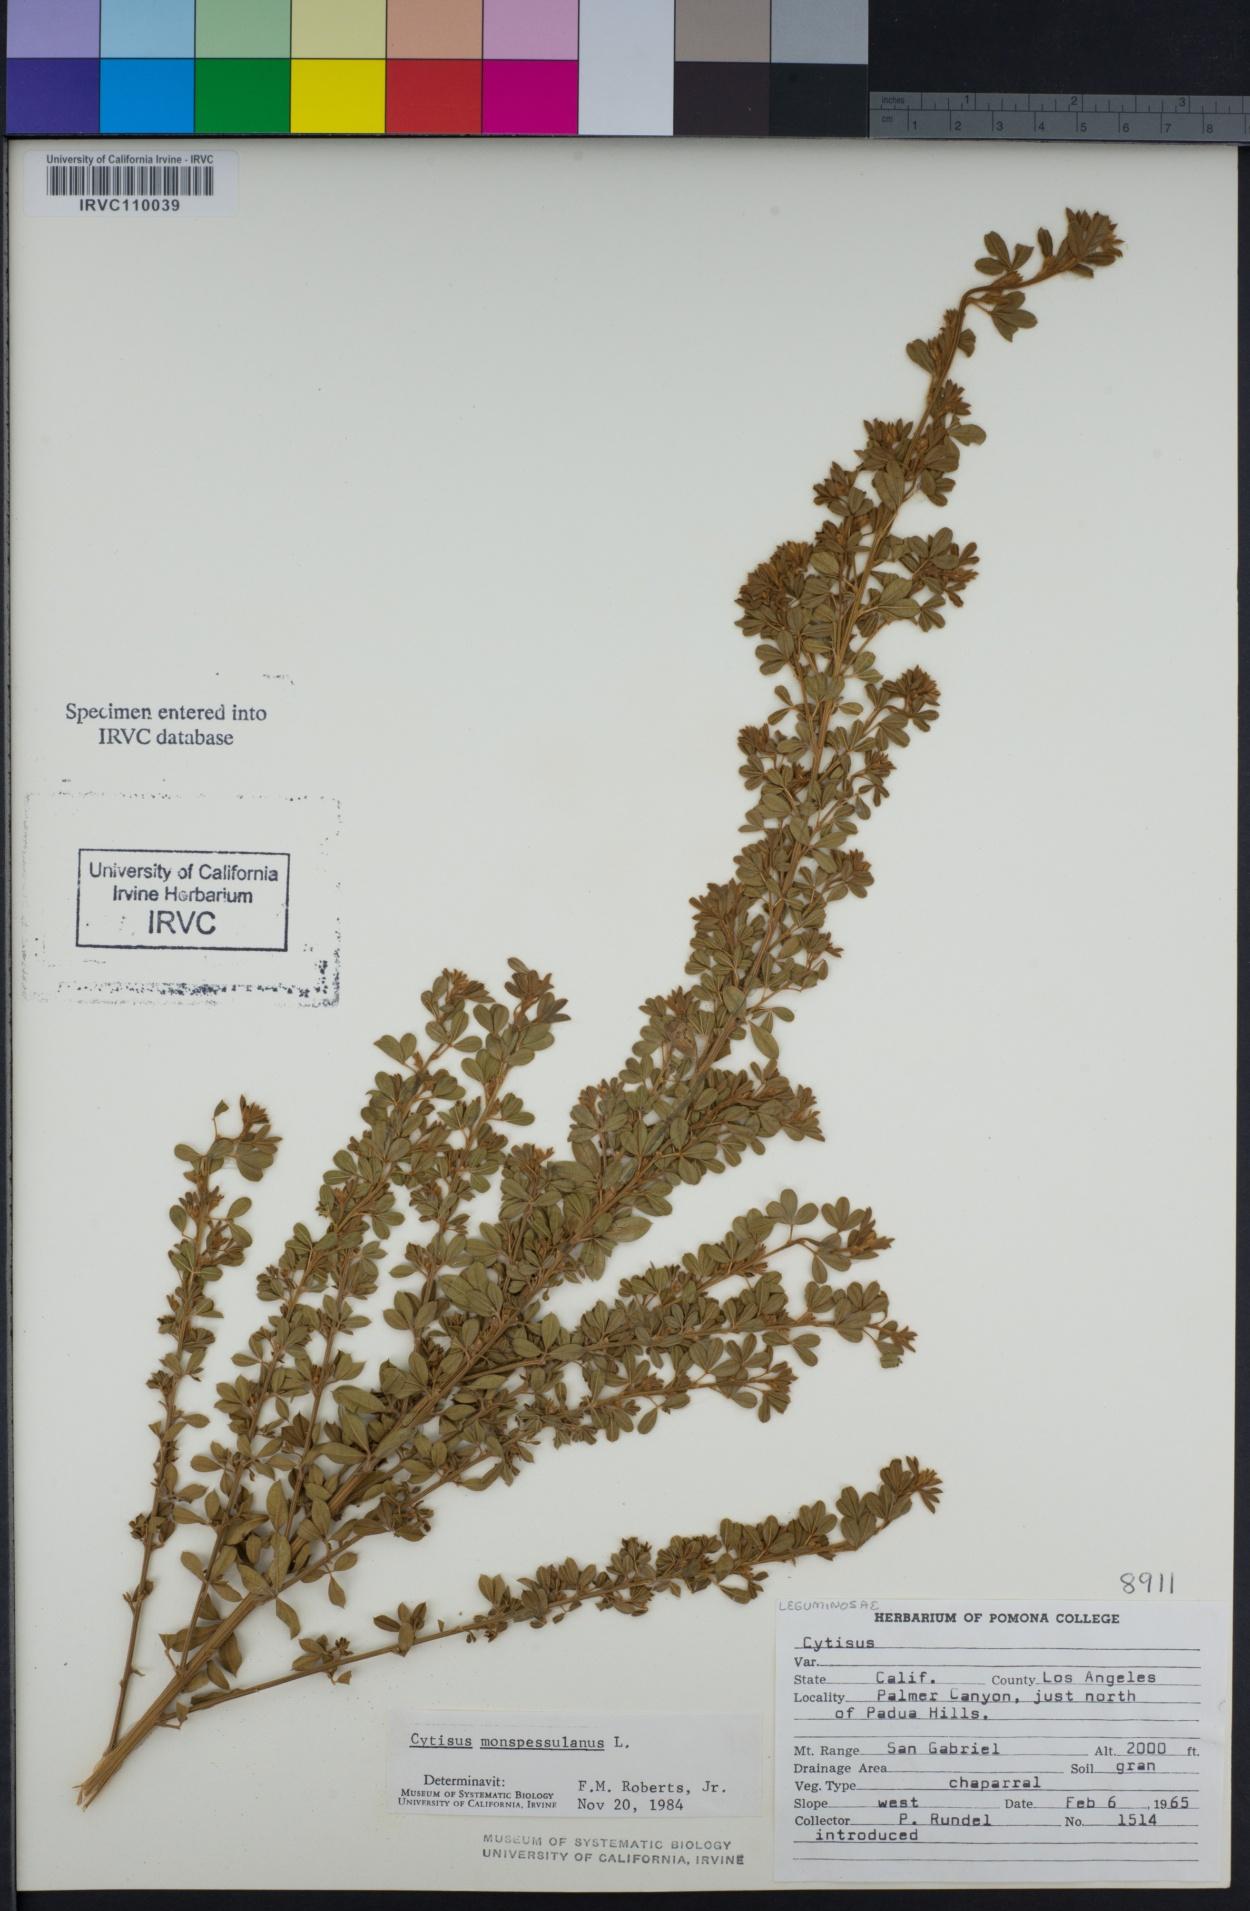 Cytisus image